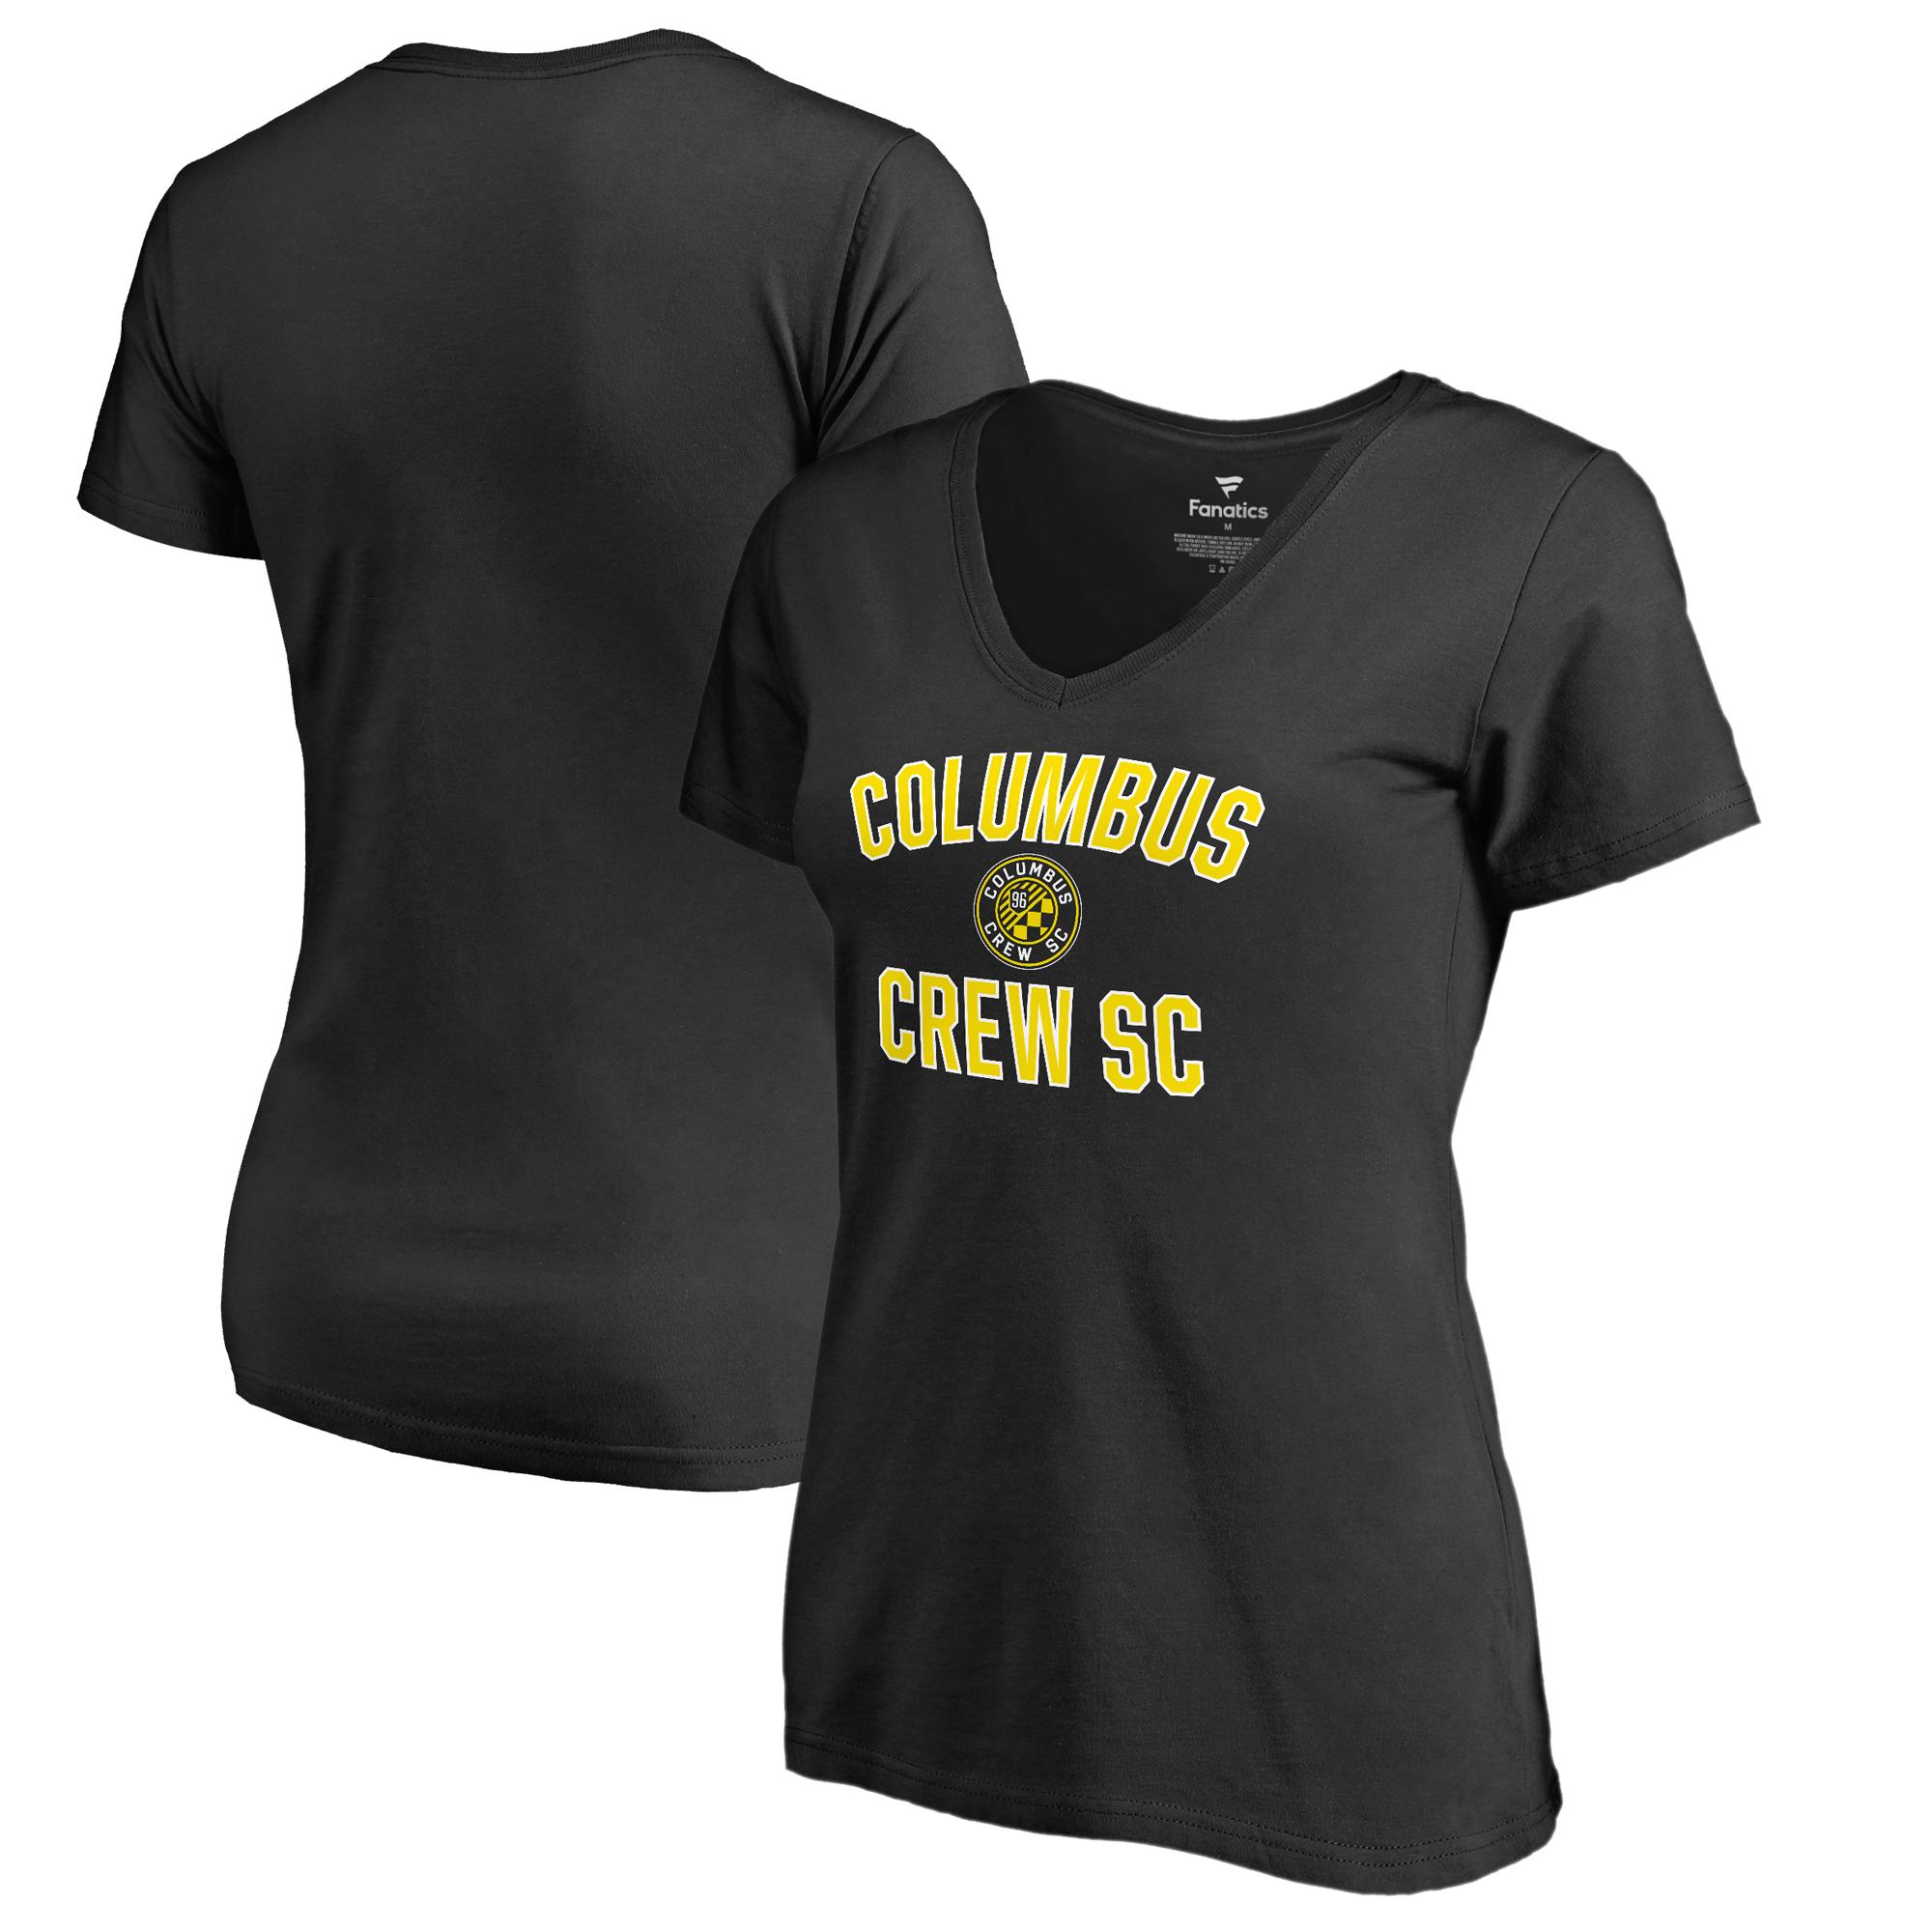 Columbus Crew SC Fanatics Branded Women's Victory Arch V-Neck T-Shirt - Black